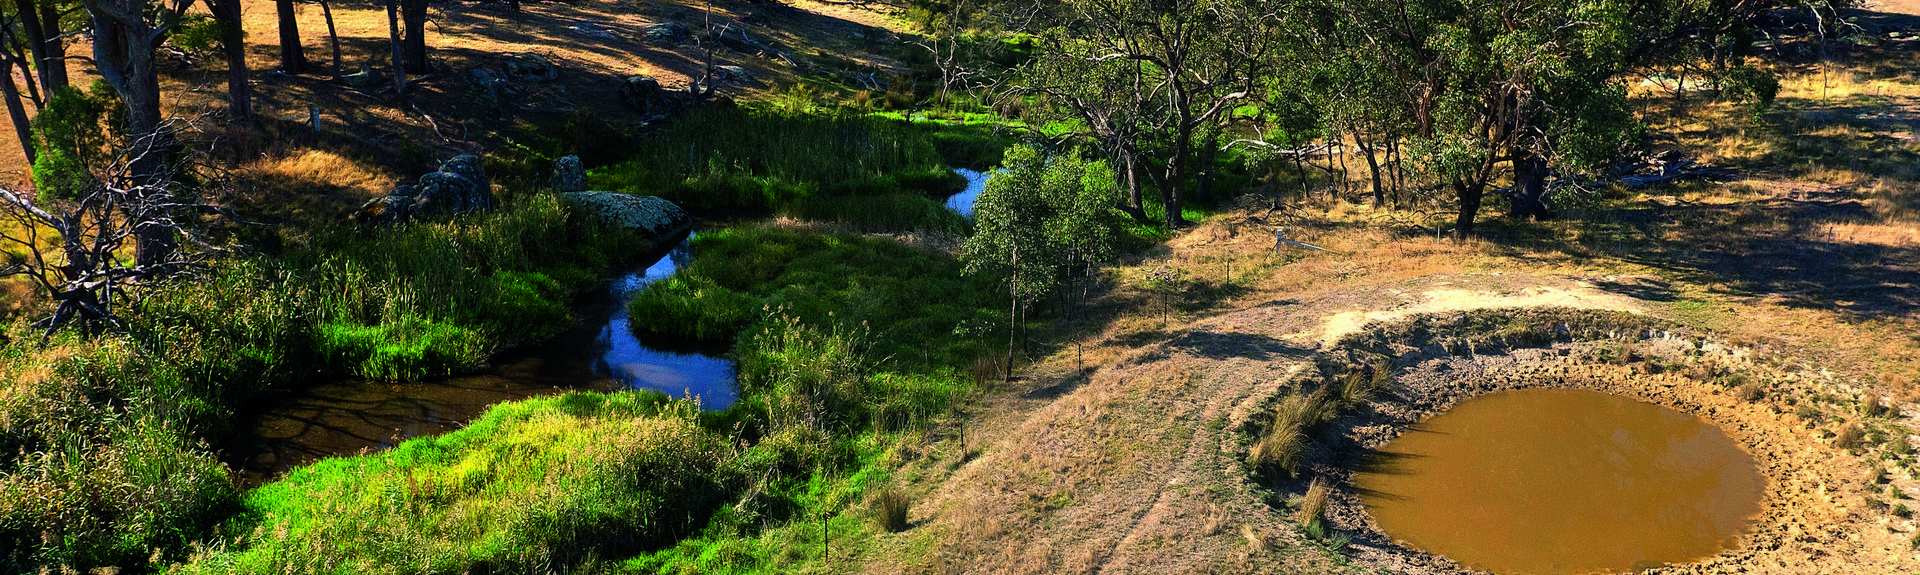 Labyrinthe Avenel Maze, Labyrinthe Avenel, Victoria, Australie